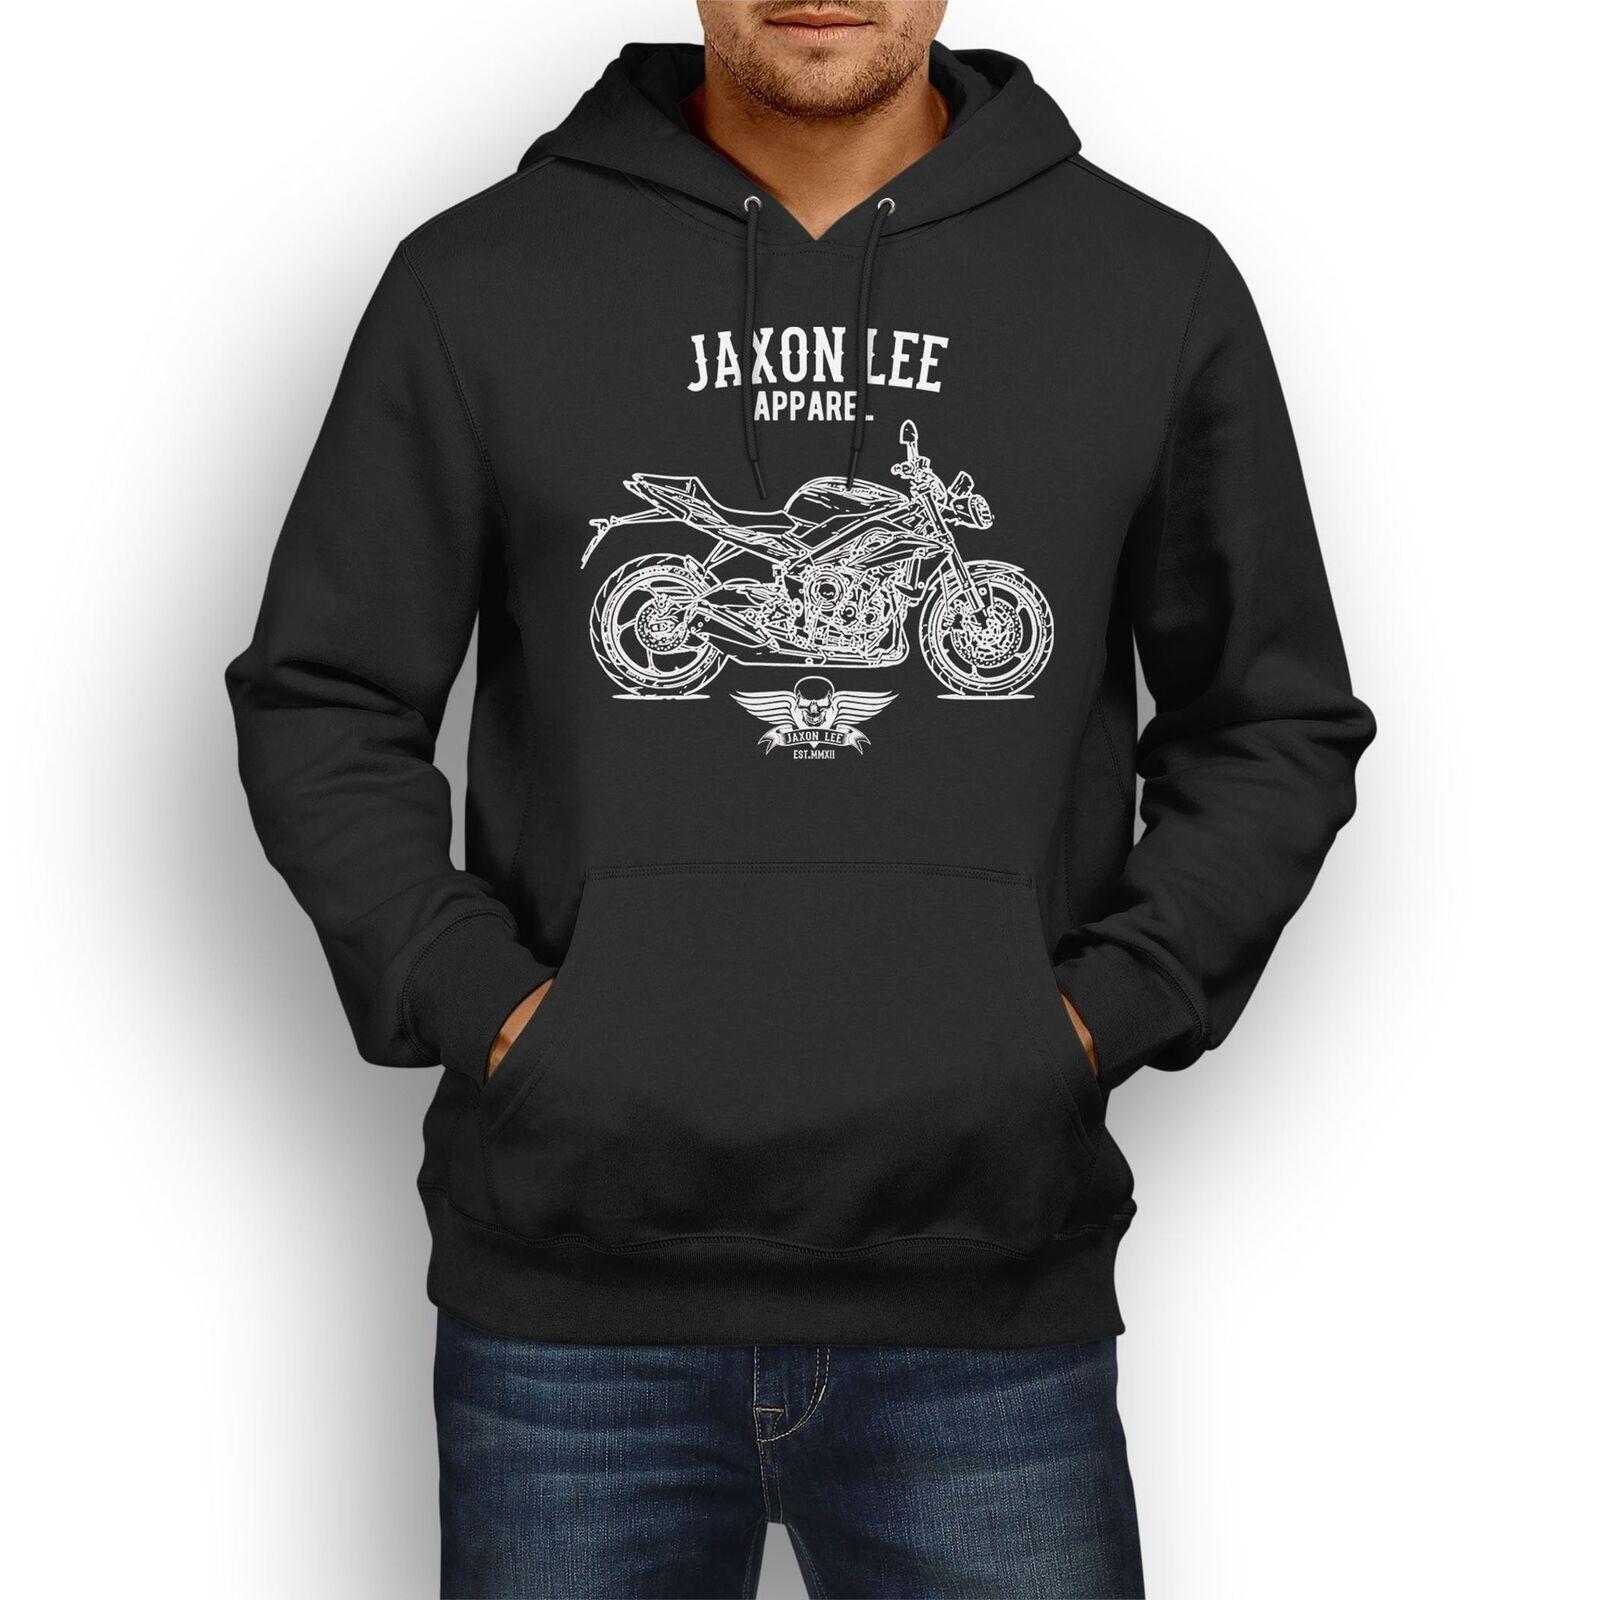 Jaxon Lee Triumph Triumph Triumph Street Triple 2016 inspirot Motorcycle Art Hoody | Ab dem neuesten Modell  4c80e2